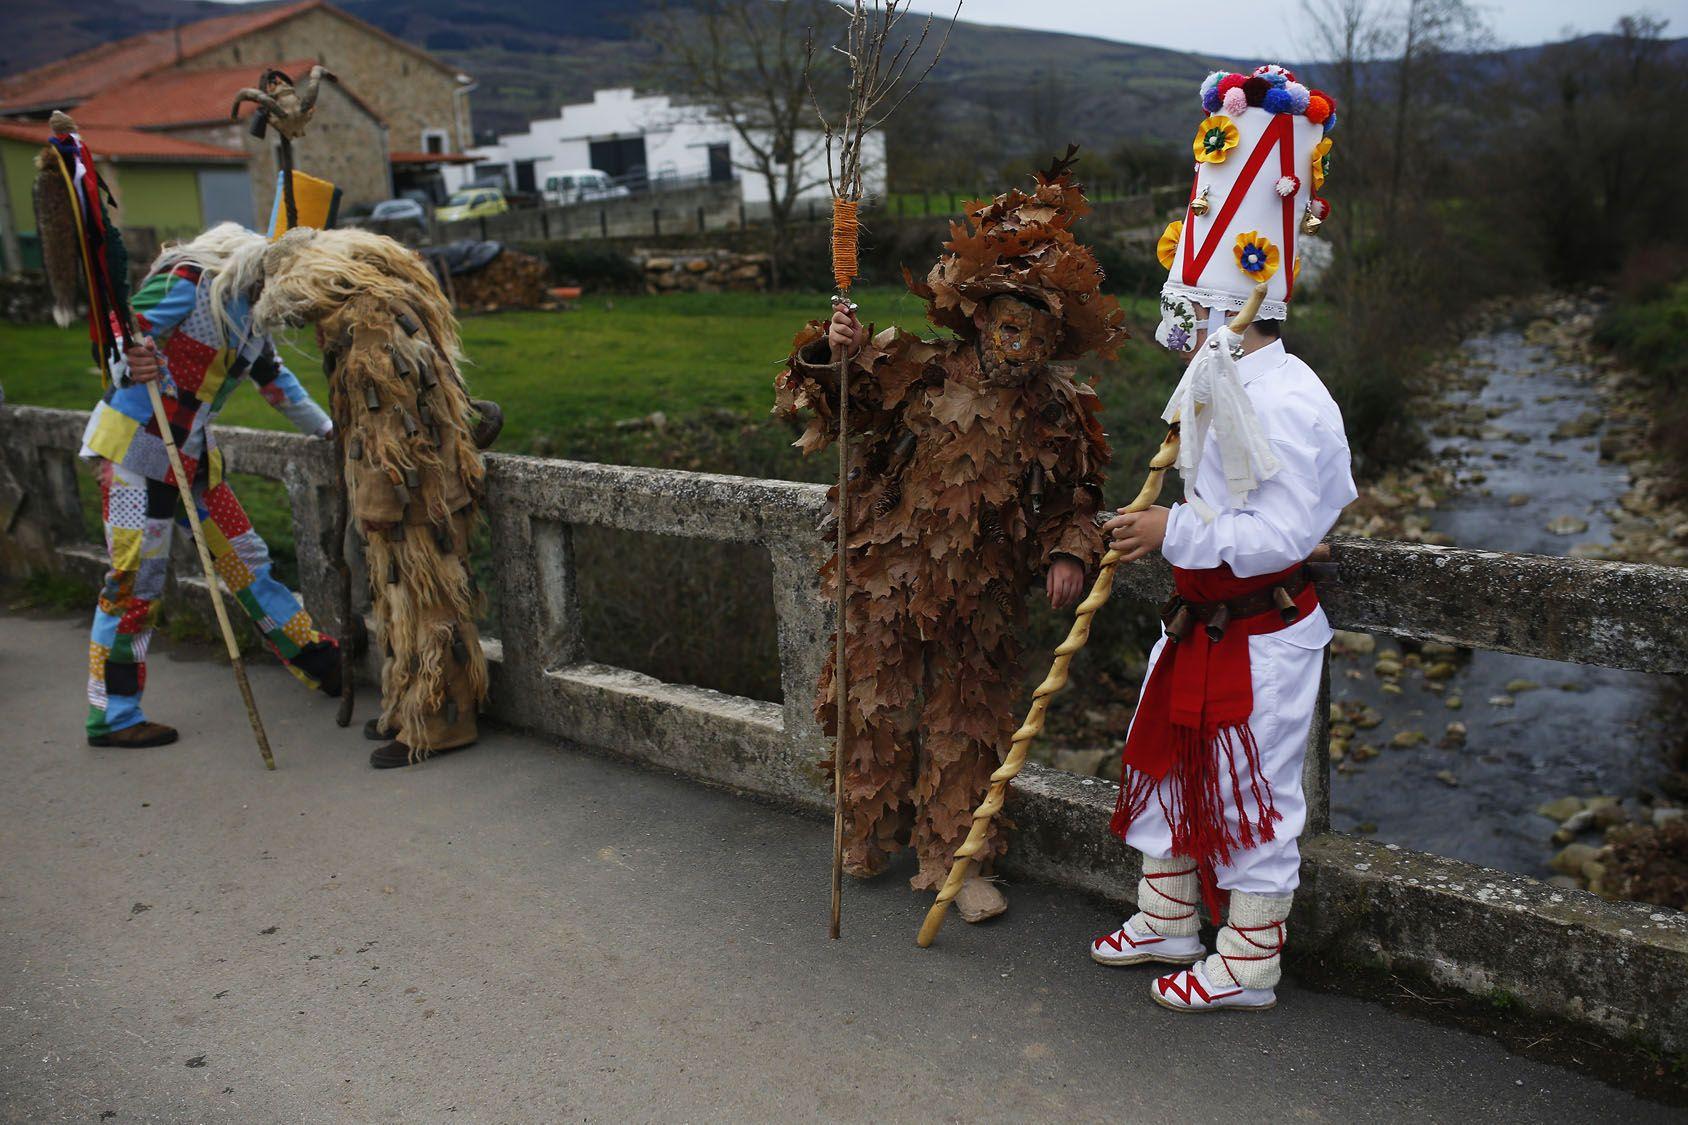 Northern Spain's La Vijanera festival